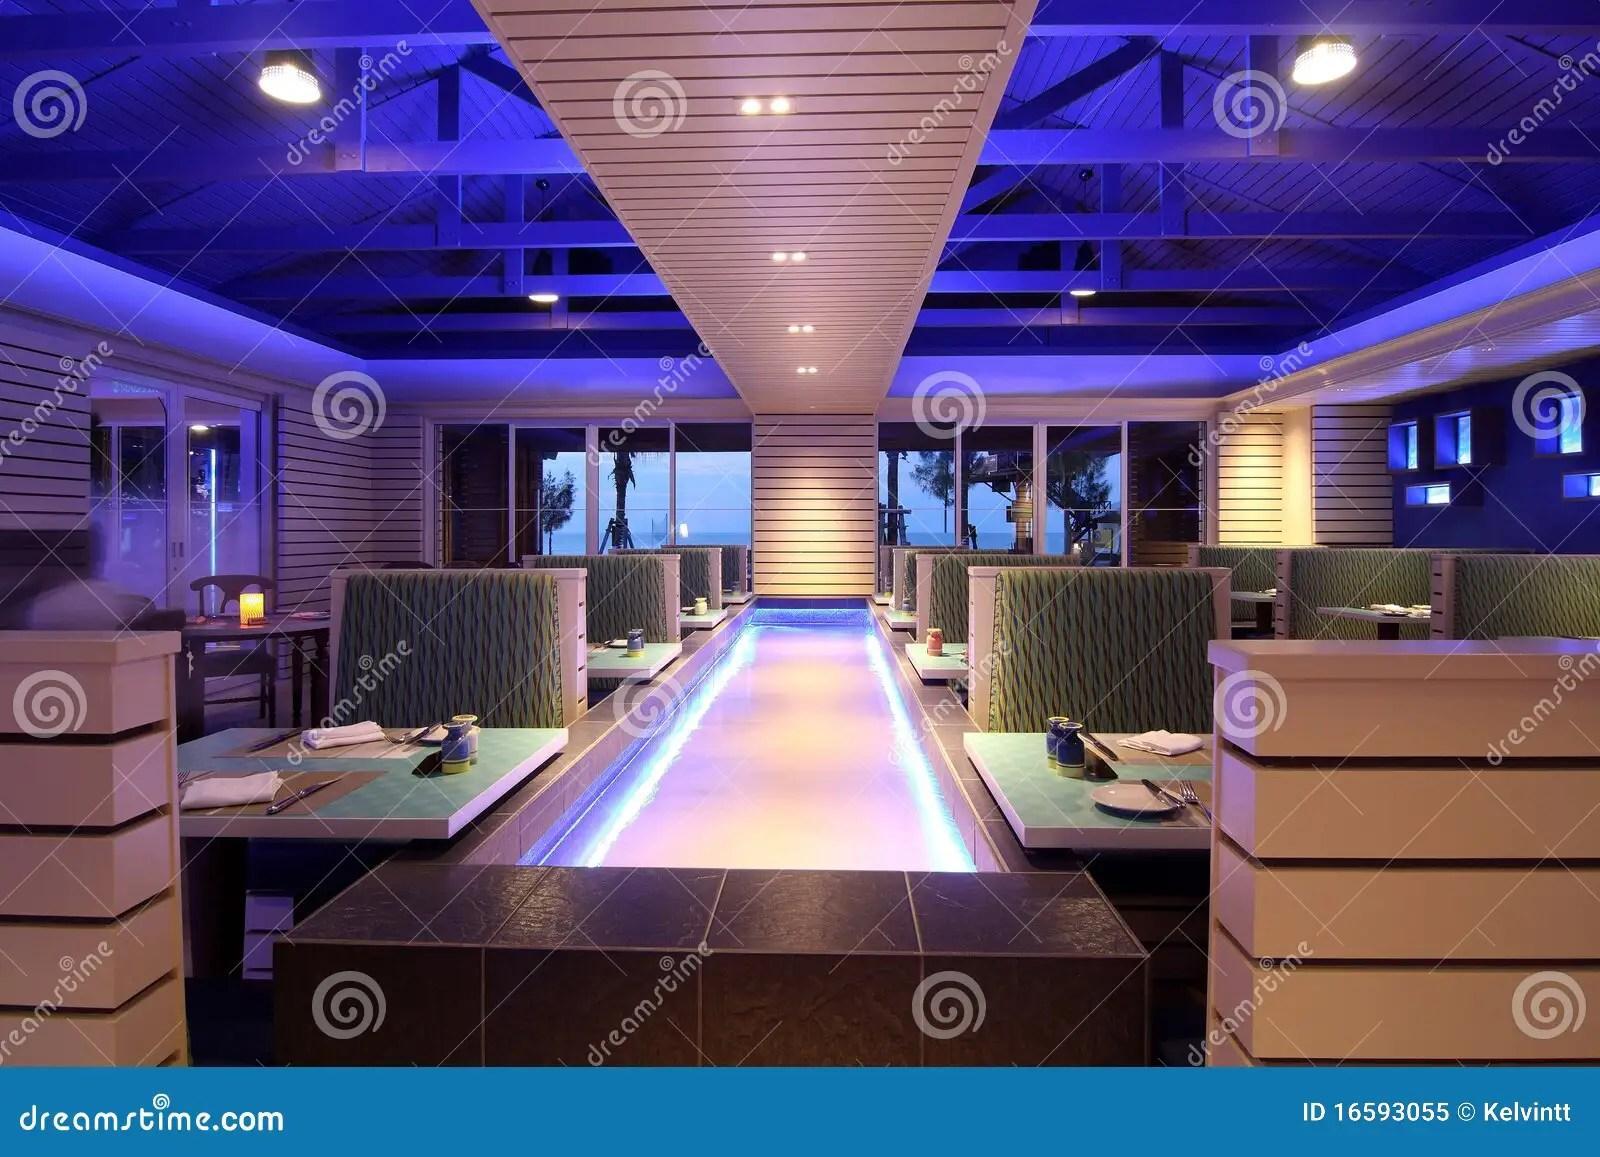 Abstract Interior Design Concepts